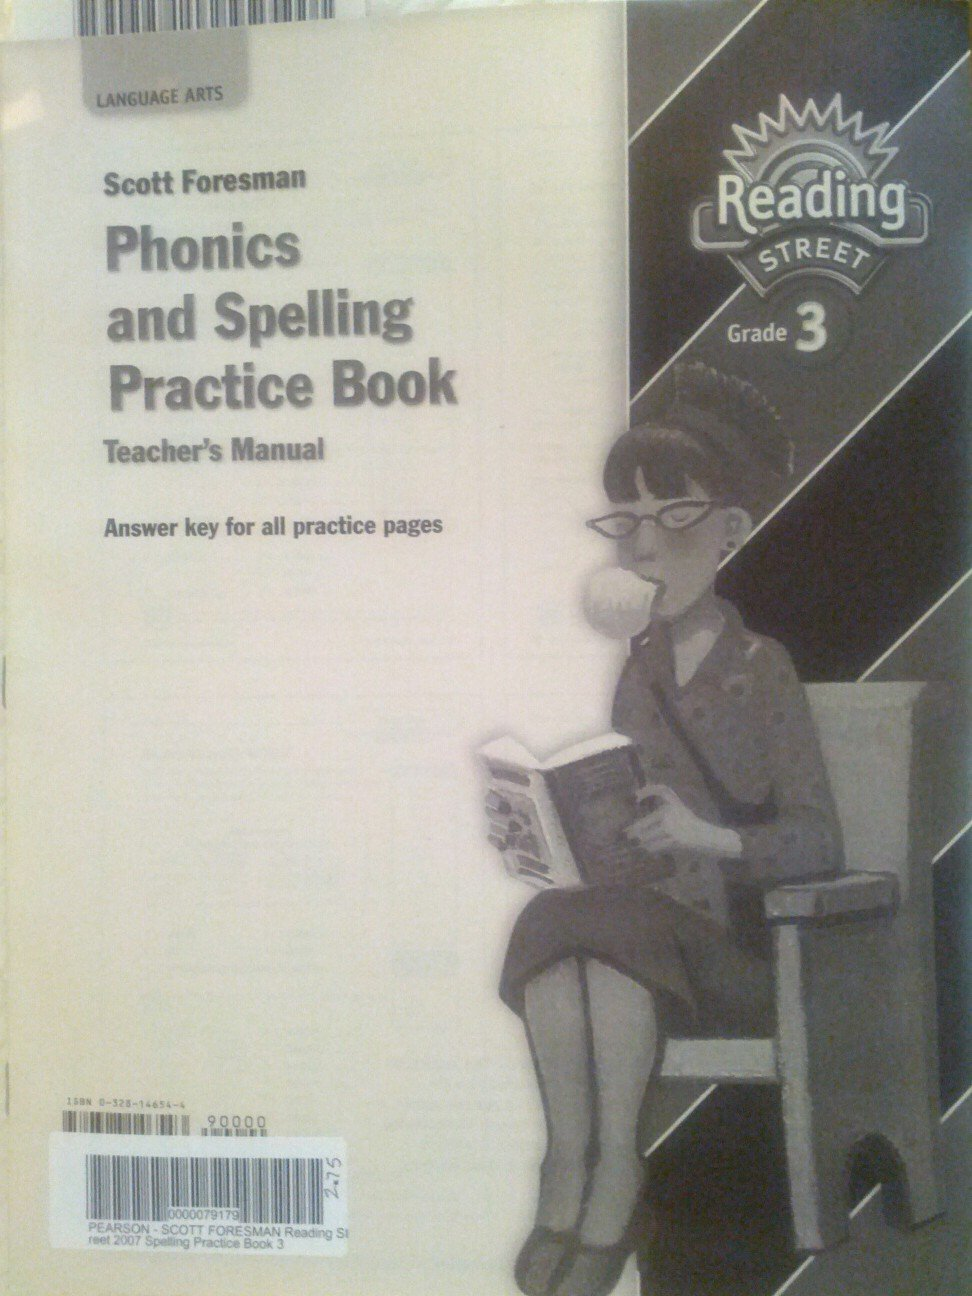 Phonics and spelling practice book teachers manual scott foresman phonics and spelling practice book teachers manual scott foresman reading street grade 3 9780328146543 amazon books fandeluxe Images